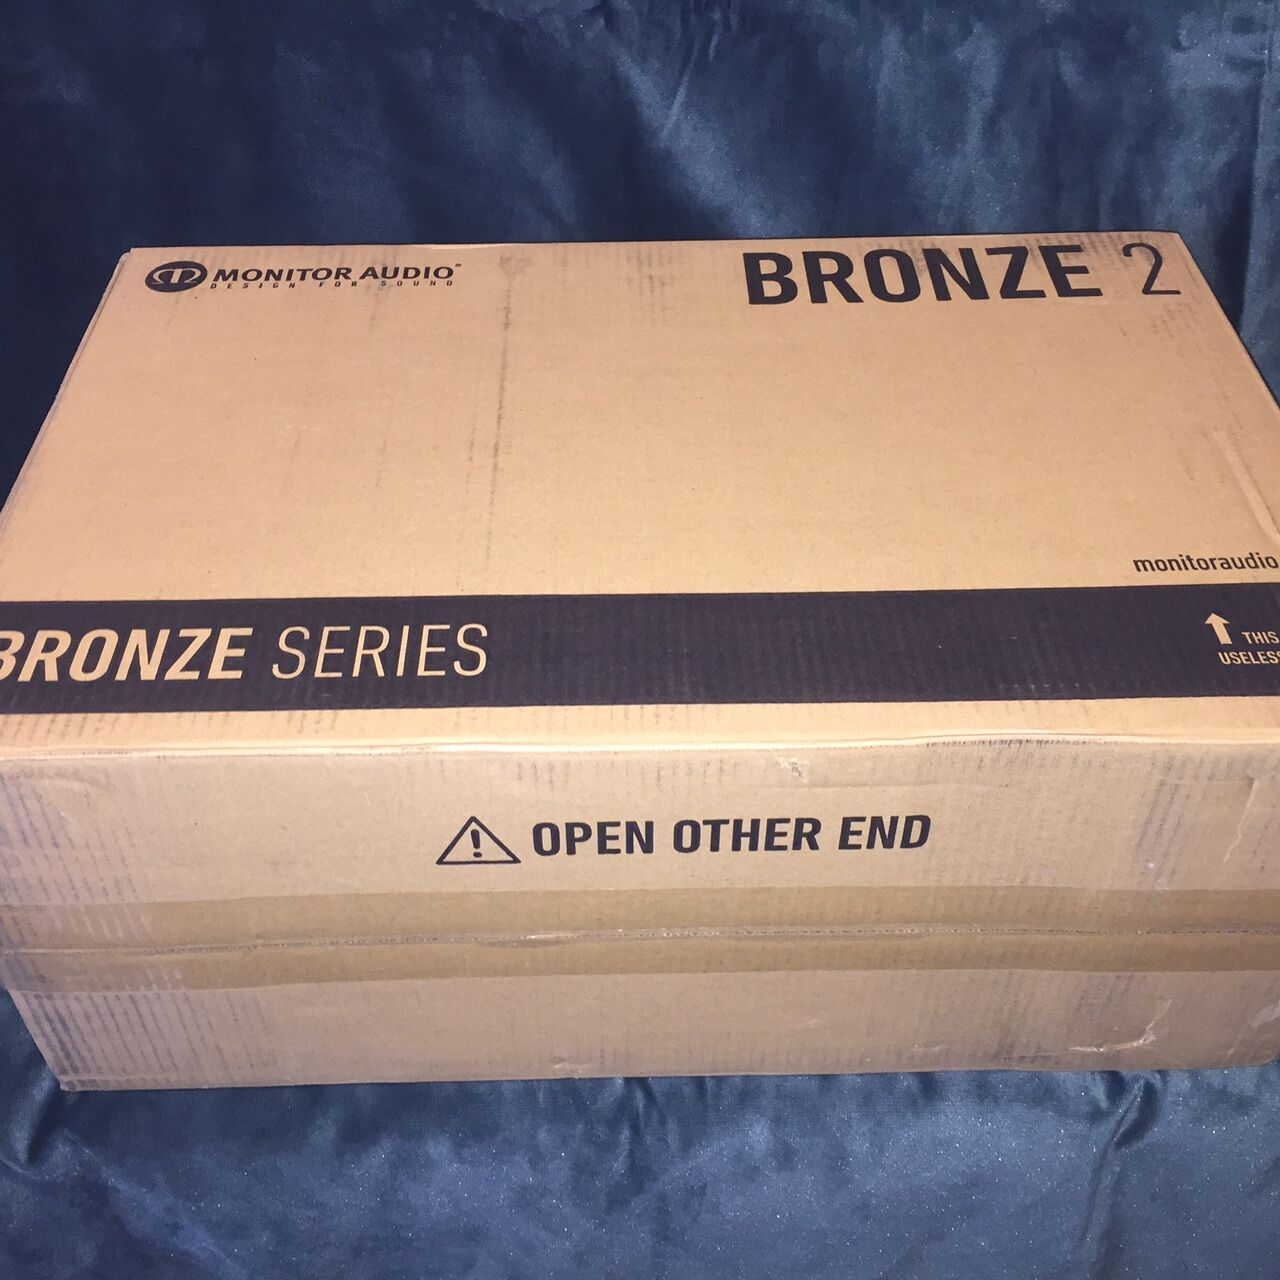 BRANDNEWSEALED Monitor Audio Bronze 2 Bookshelf Speakers